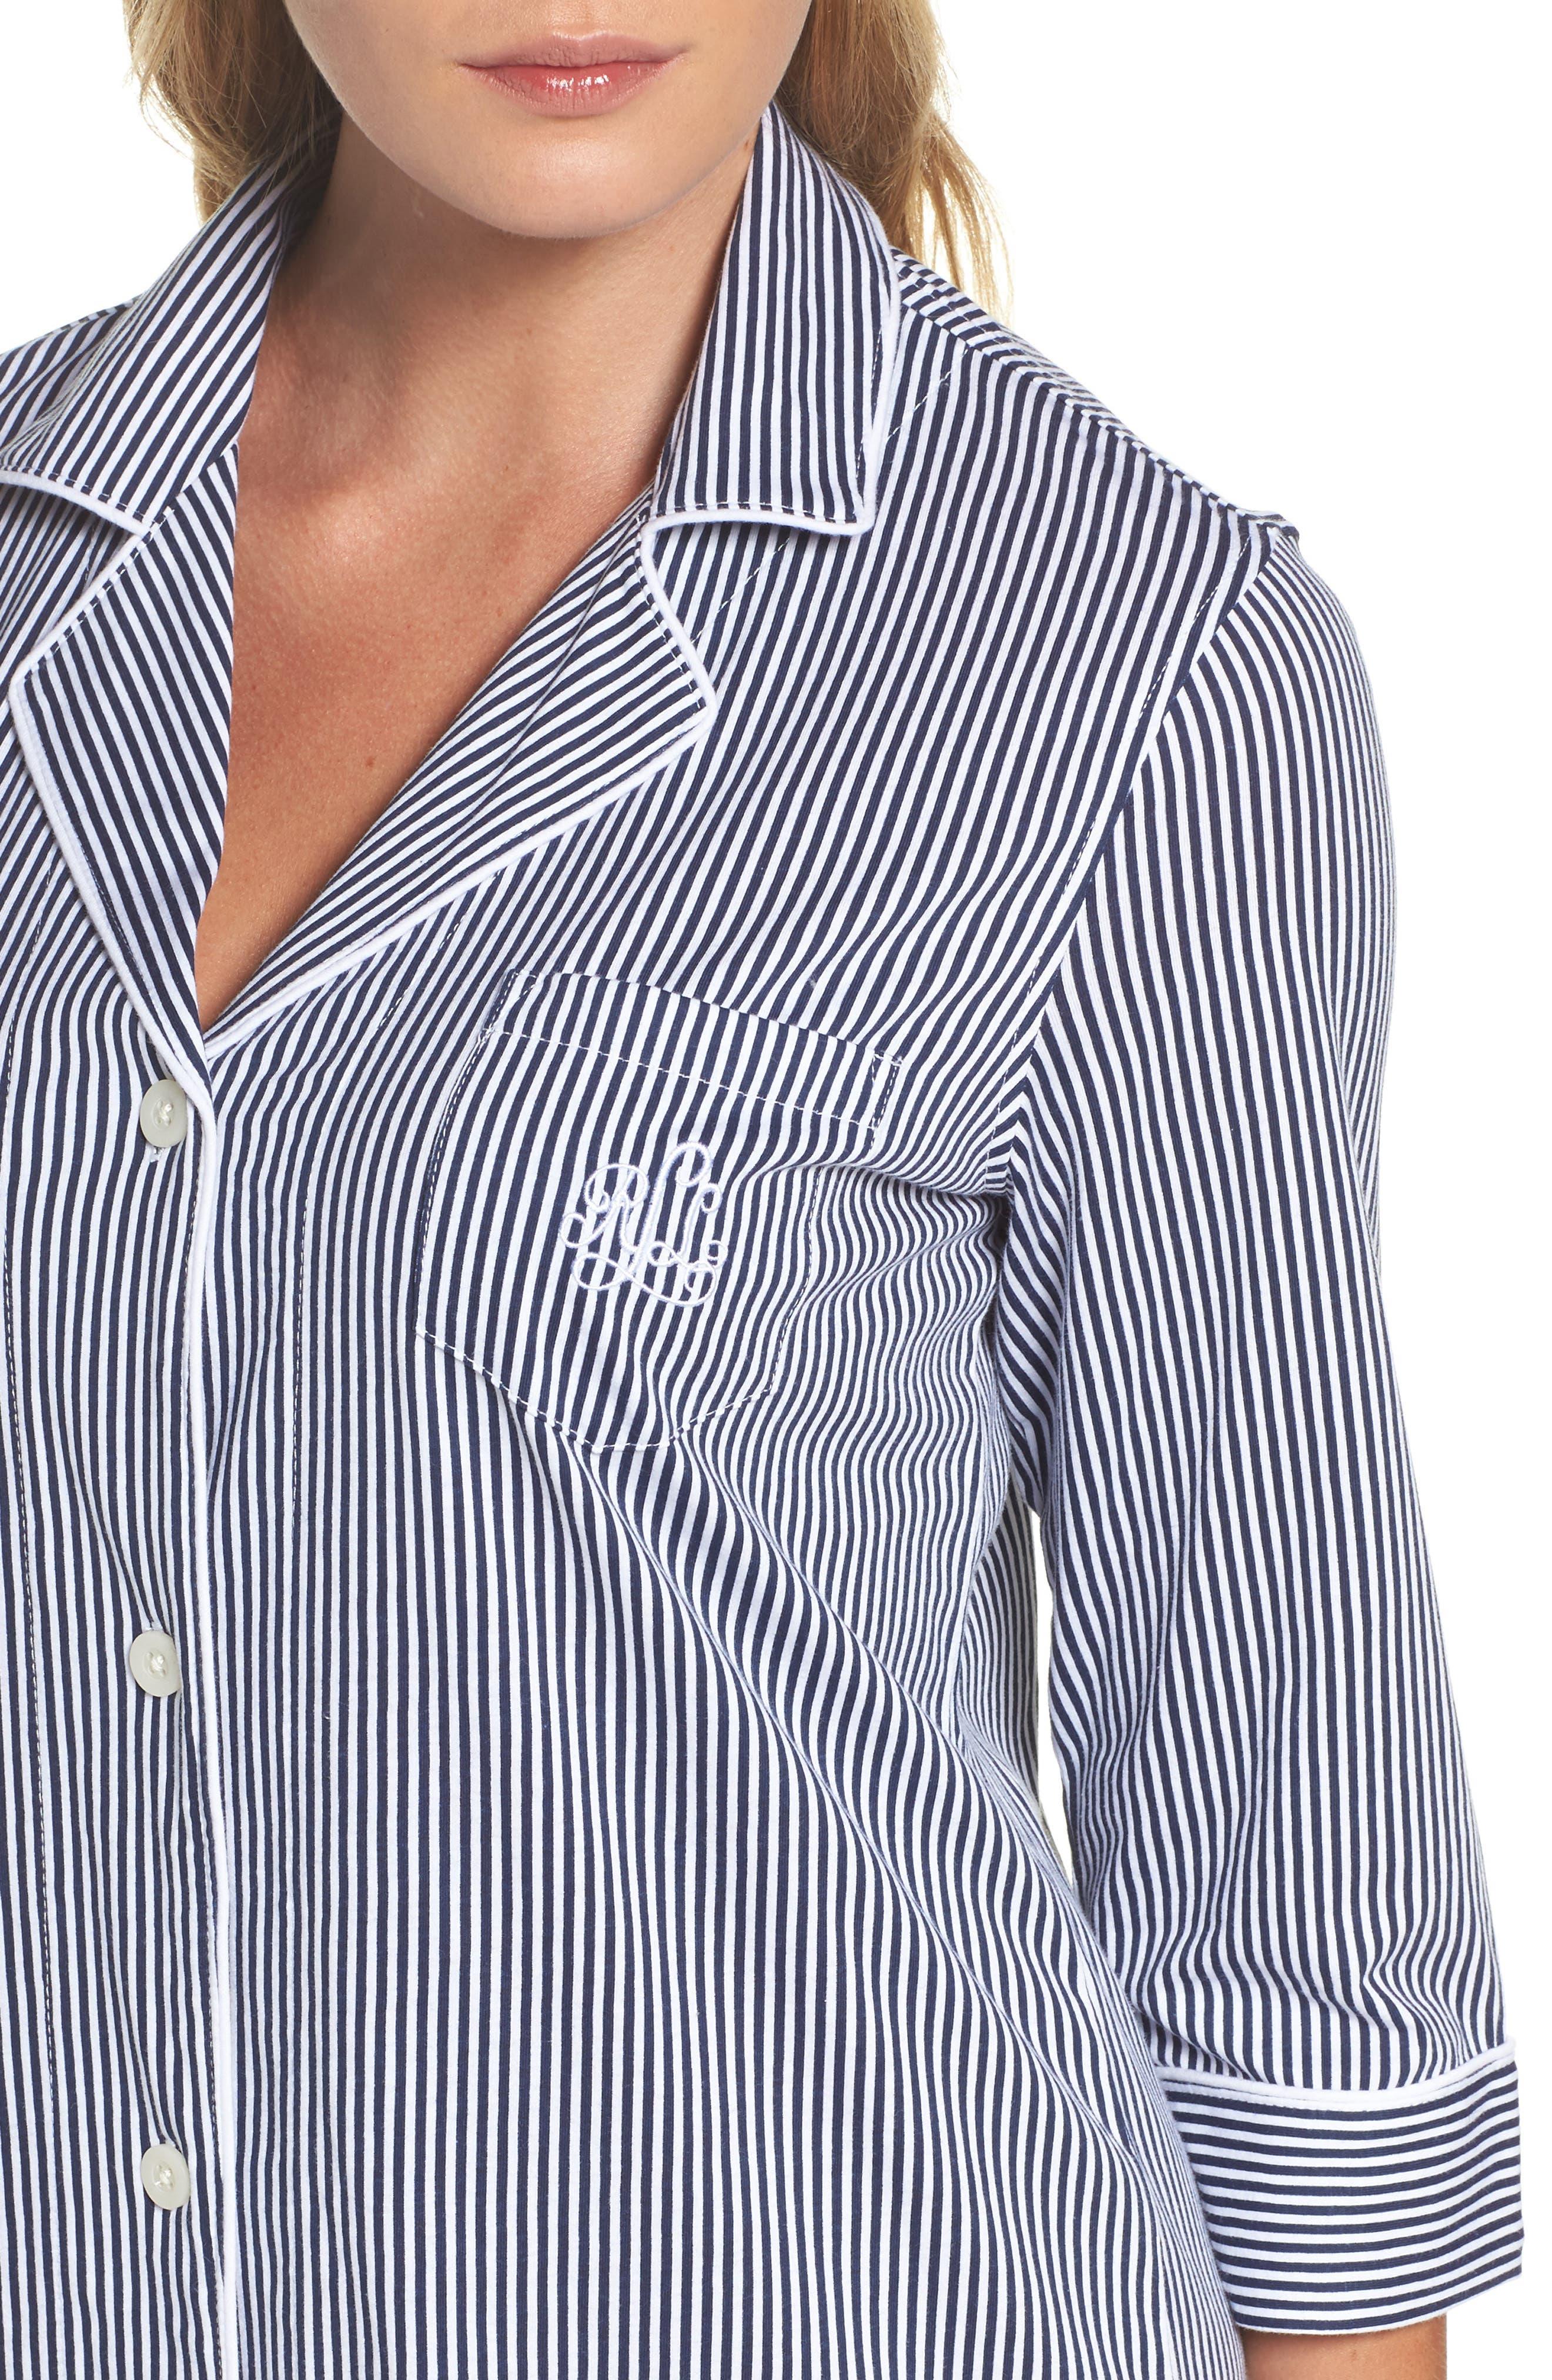 Jersey Sleep Shirt,                             Alternate thumbnail 32, color,